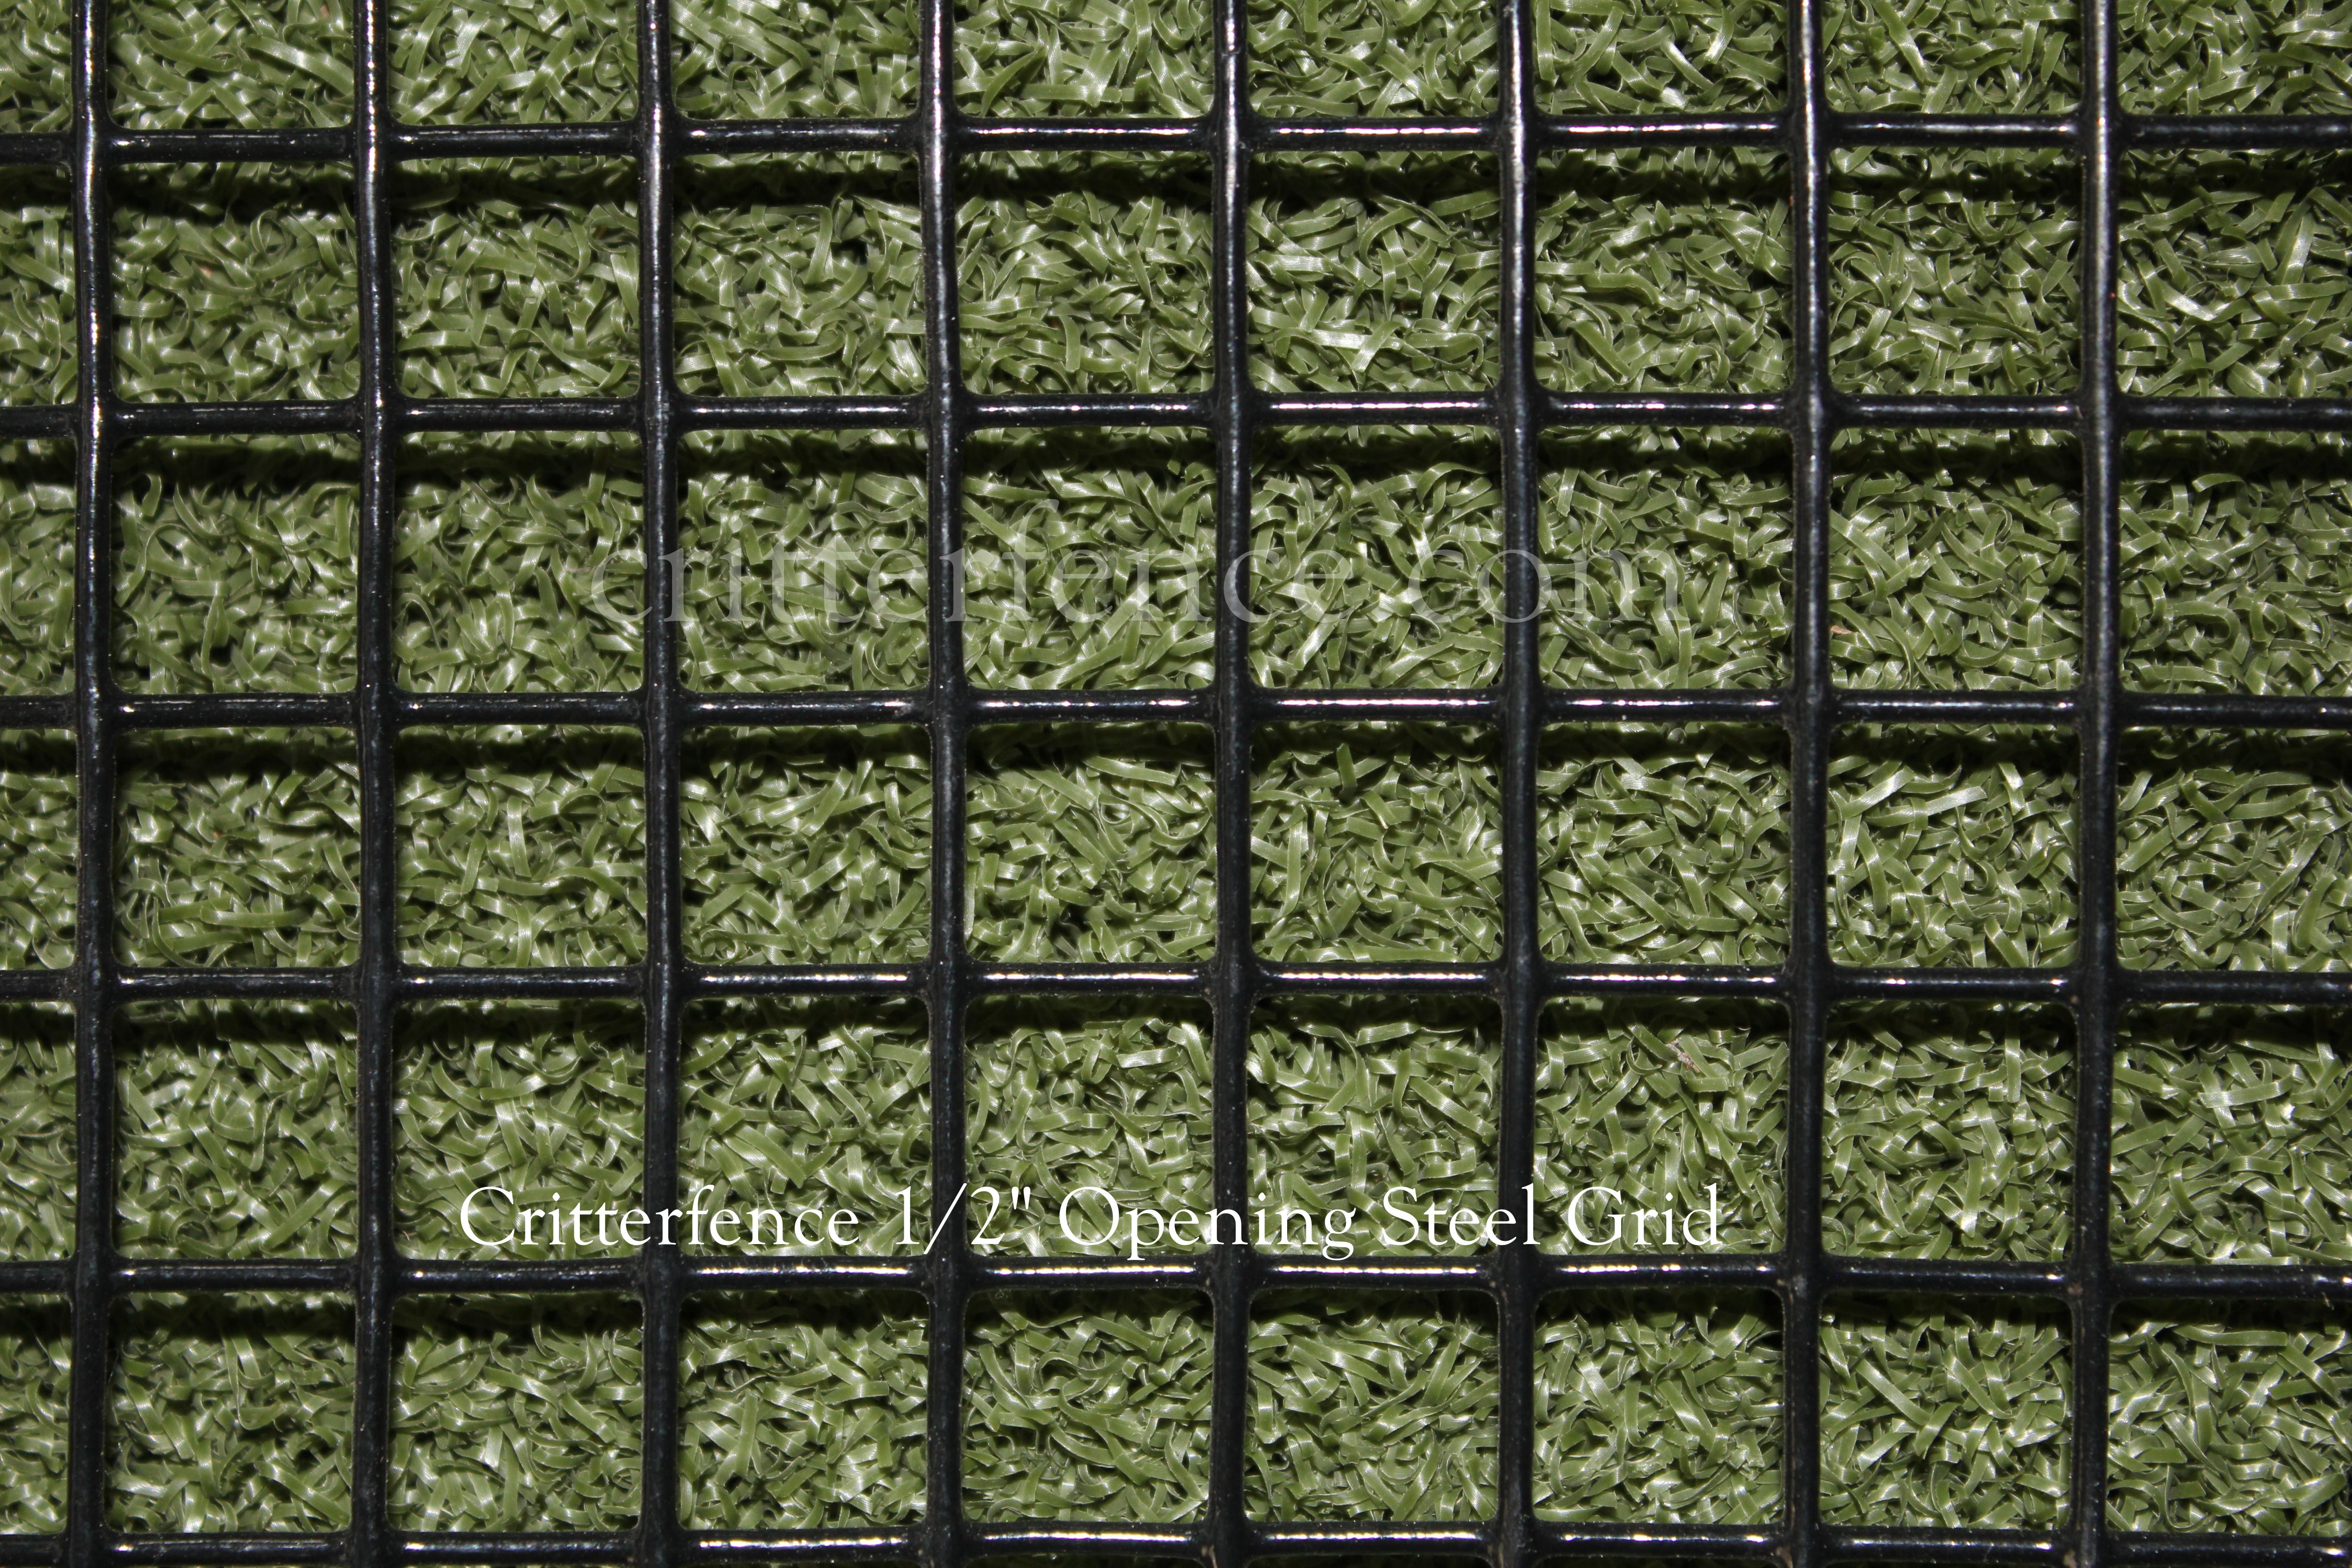 Critterfence Steel Grid 5 X 100